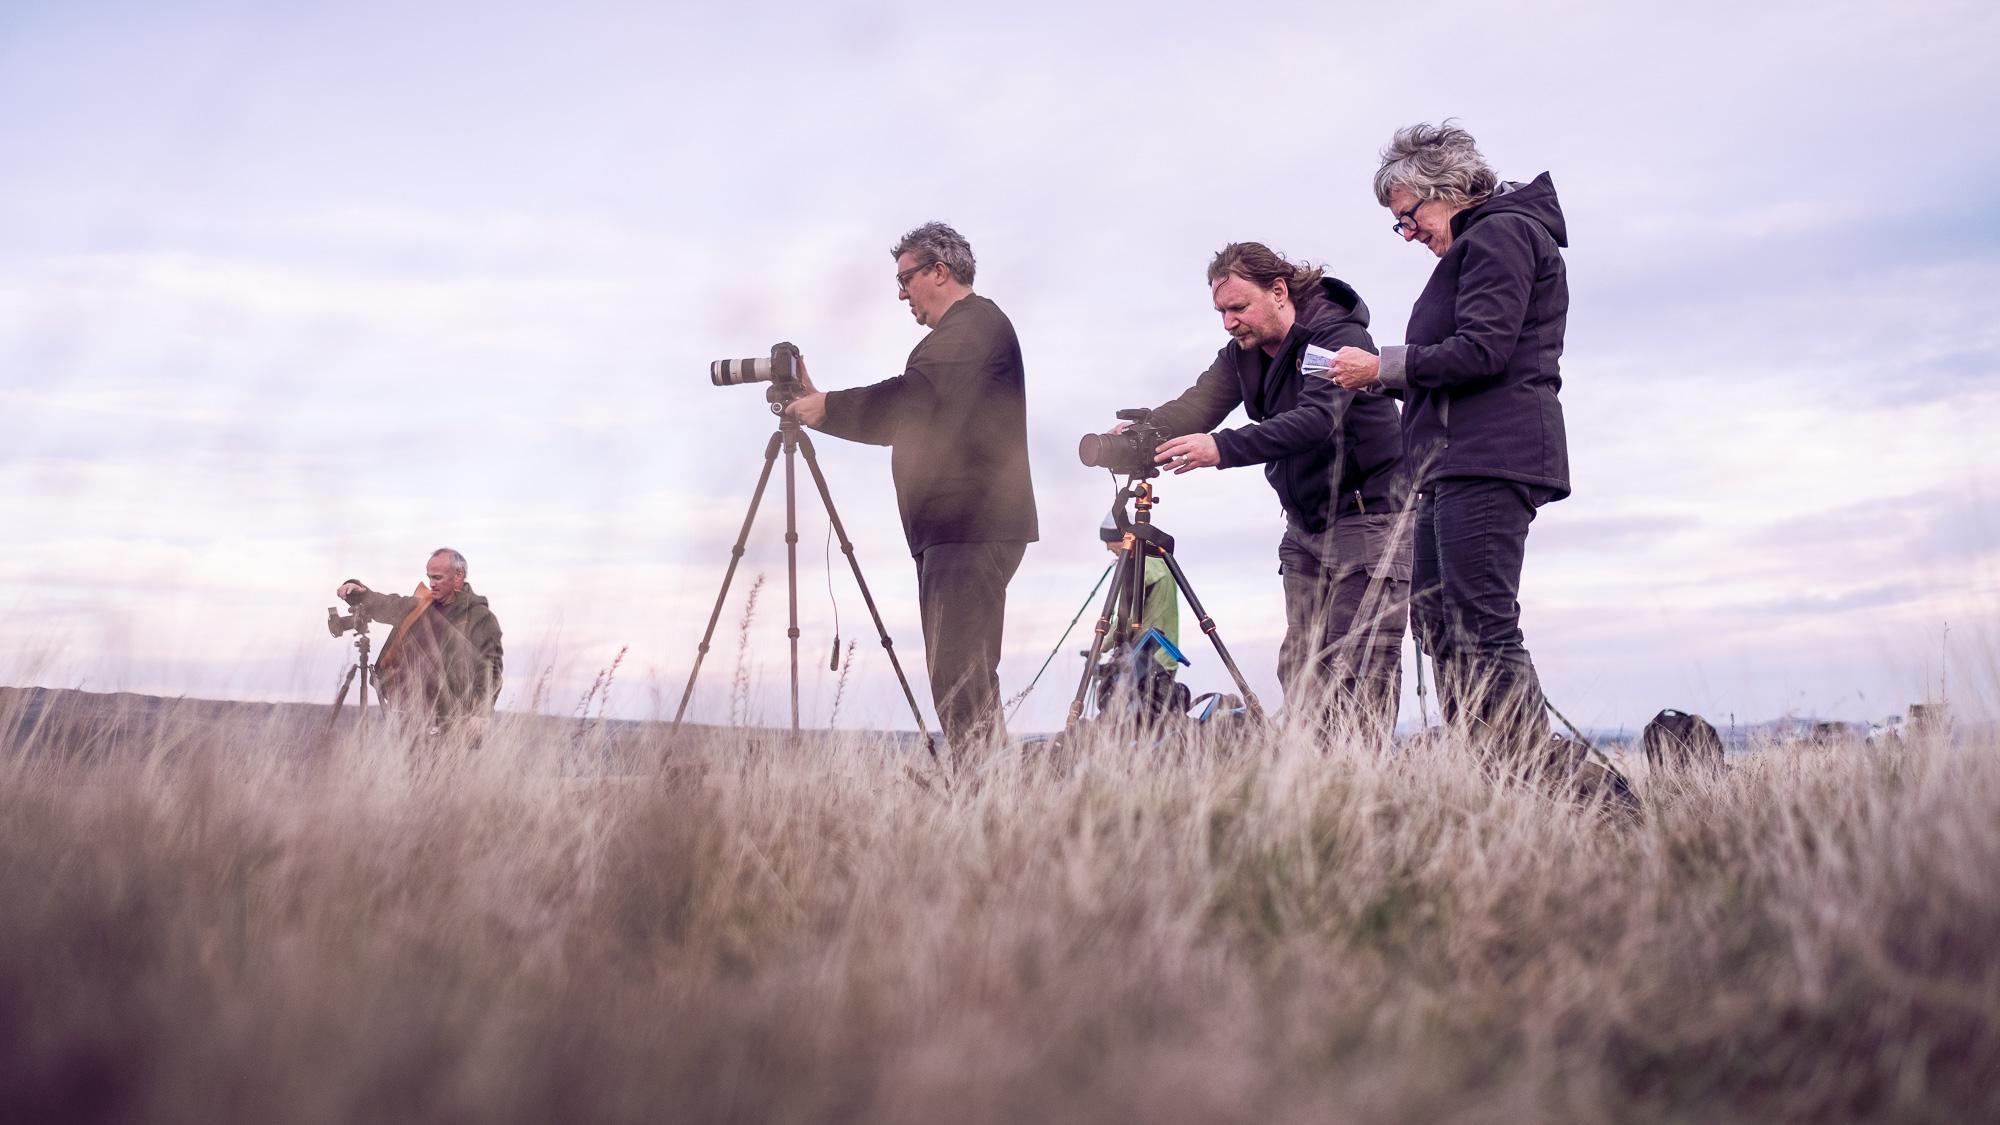 photography-workshop-newzealand-mountcook2018-22.jpg